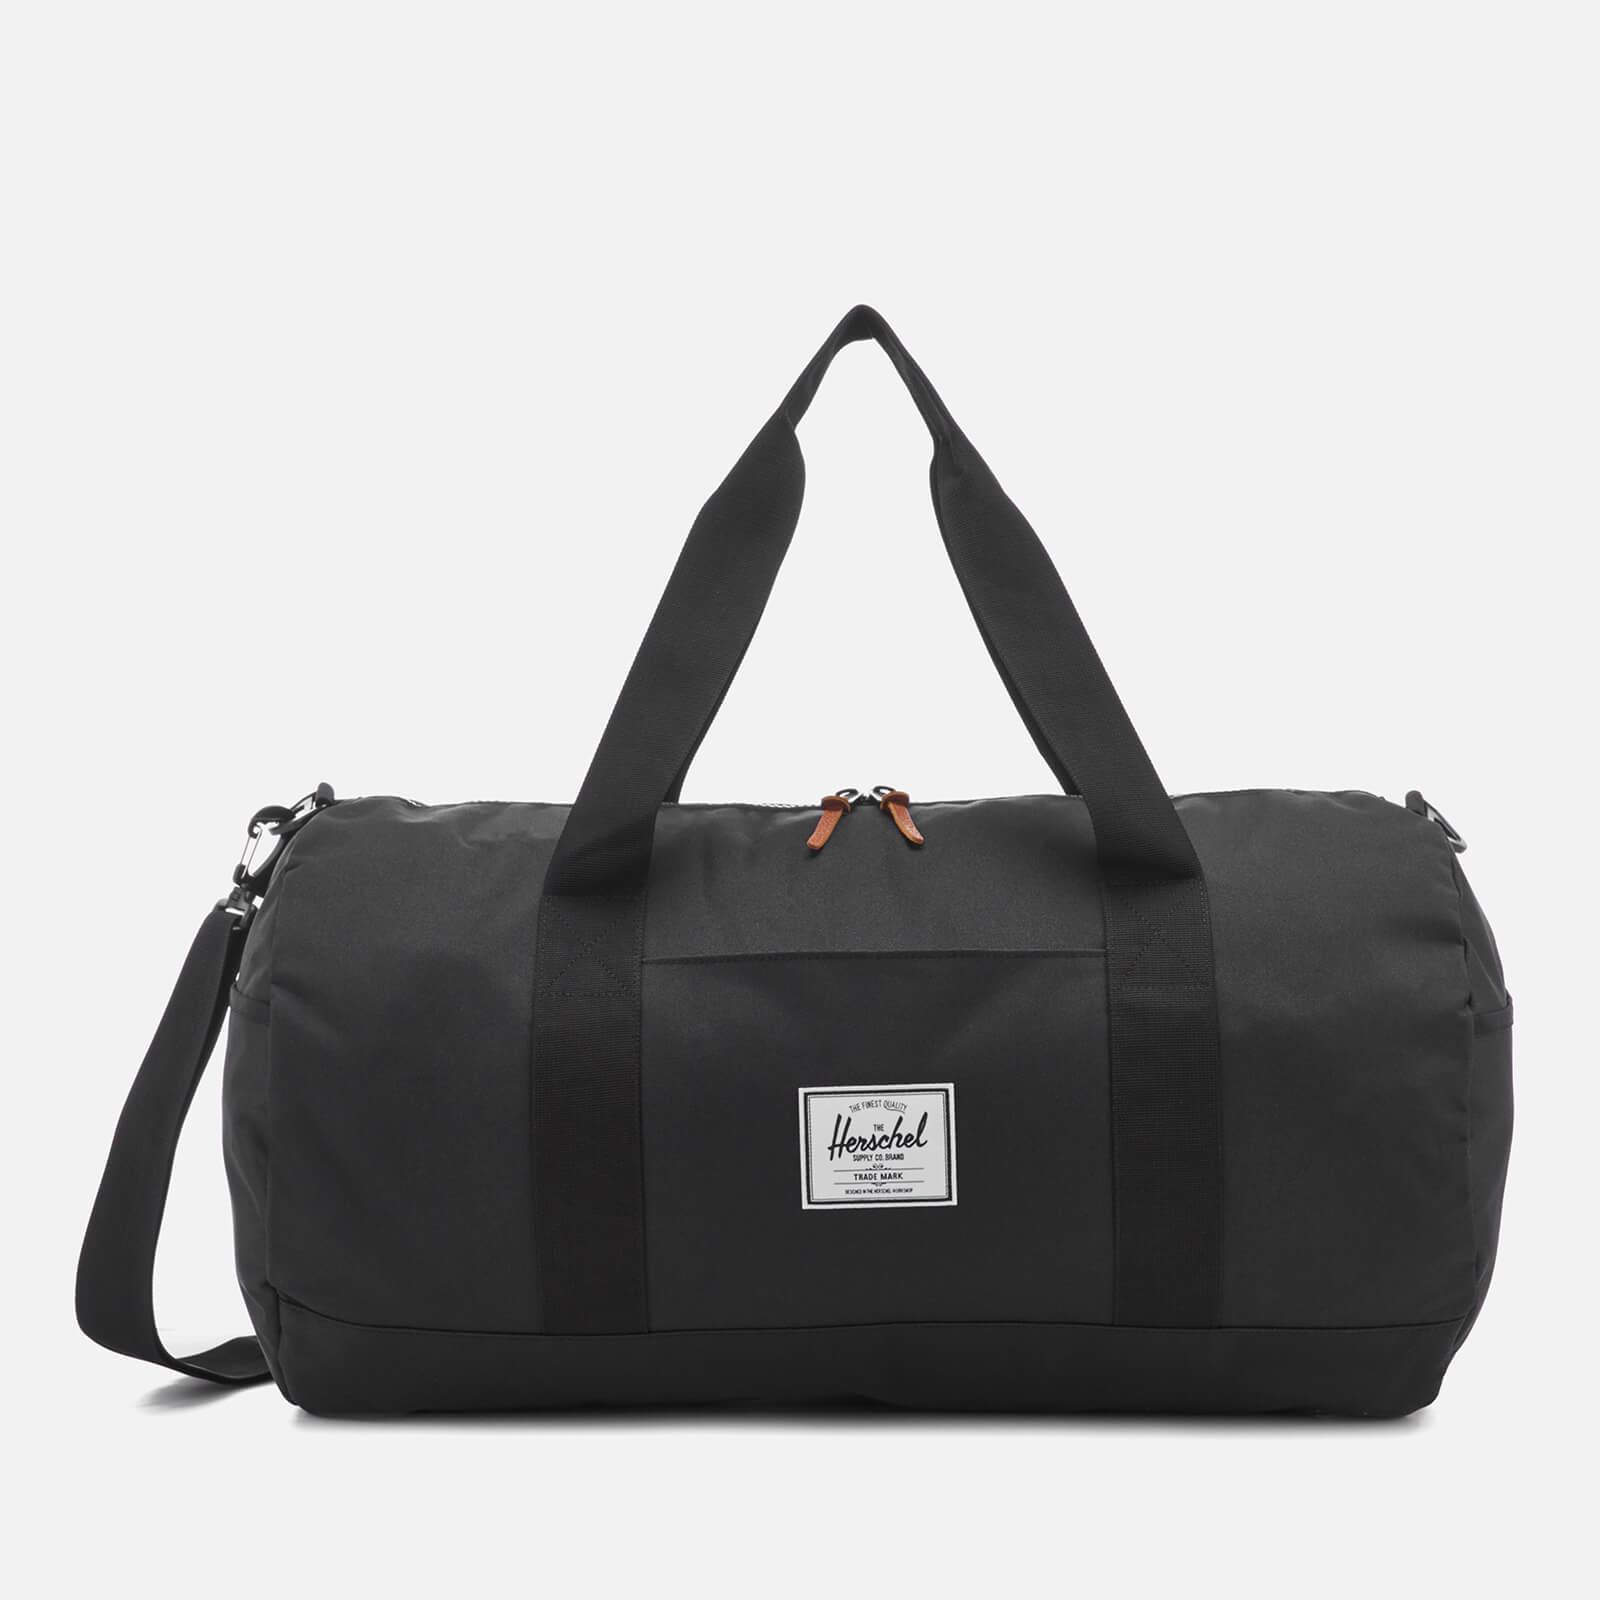 a1b82ad11855 Lyst - Herschel Supply Co. Sutton Duffle Bag in Black for Men